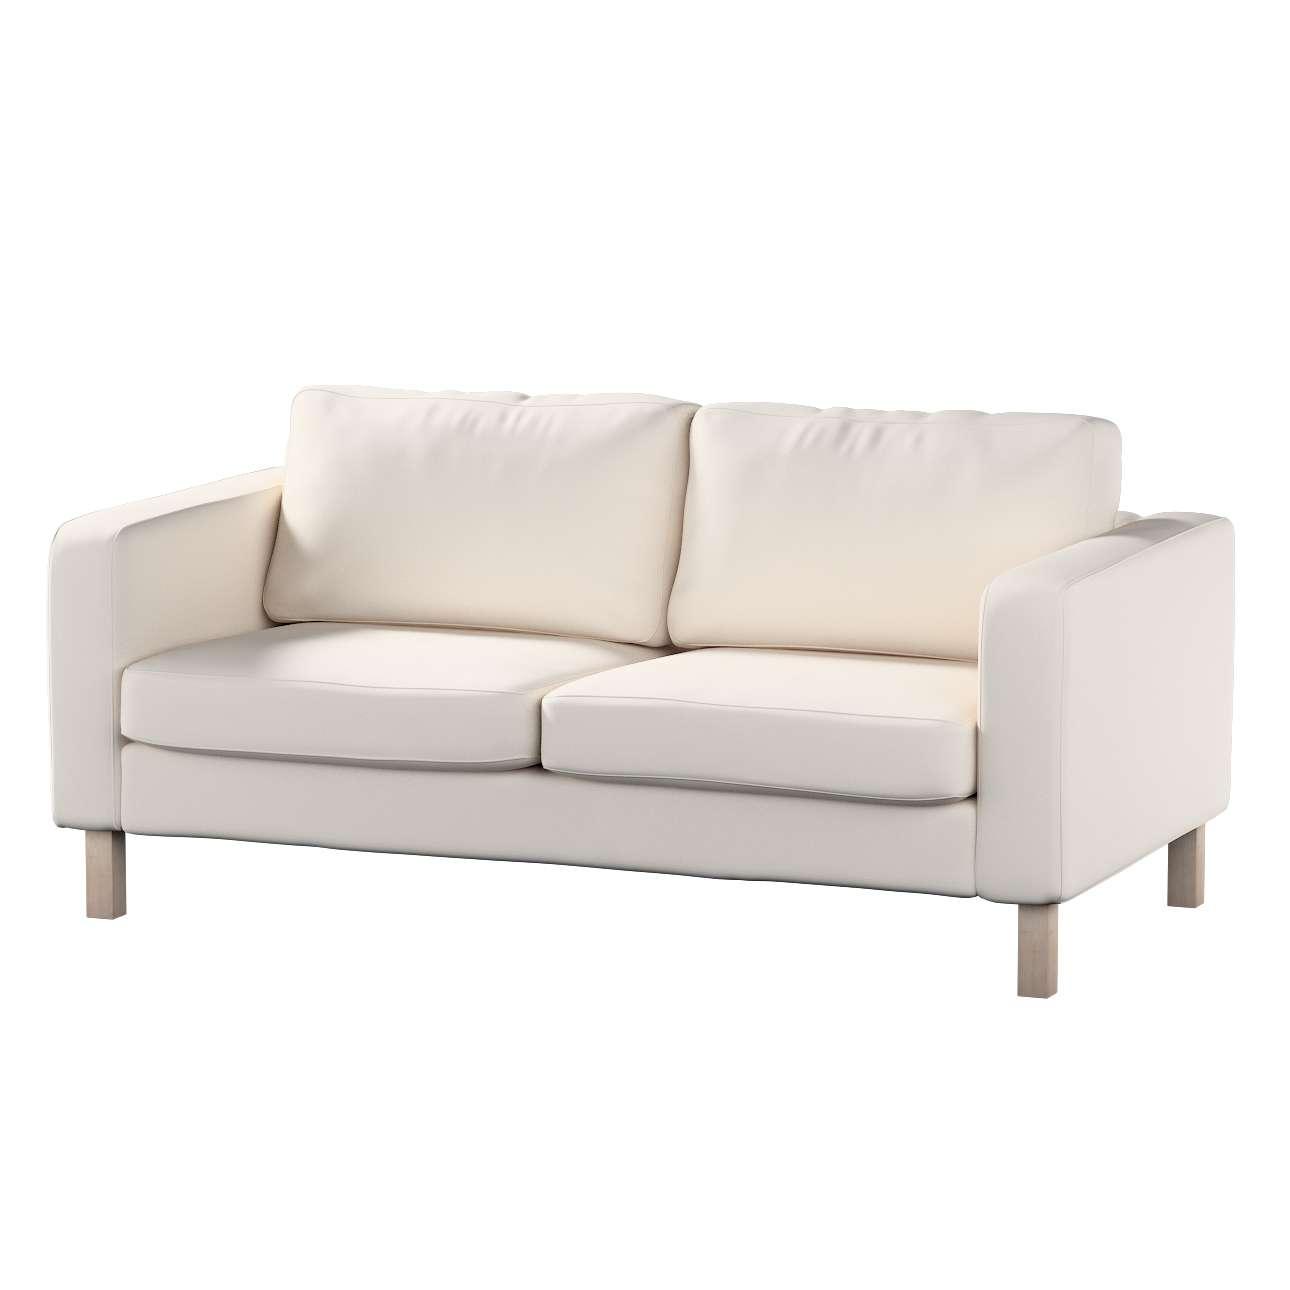 KARSLTAD dvivietės sofos užvalkalas Karlstad 2-vietės sofos užvalkalas kolekcijoje Etna , audinys: 705-01